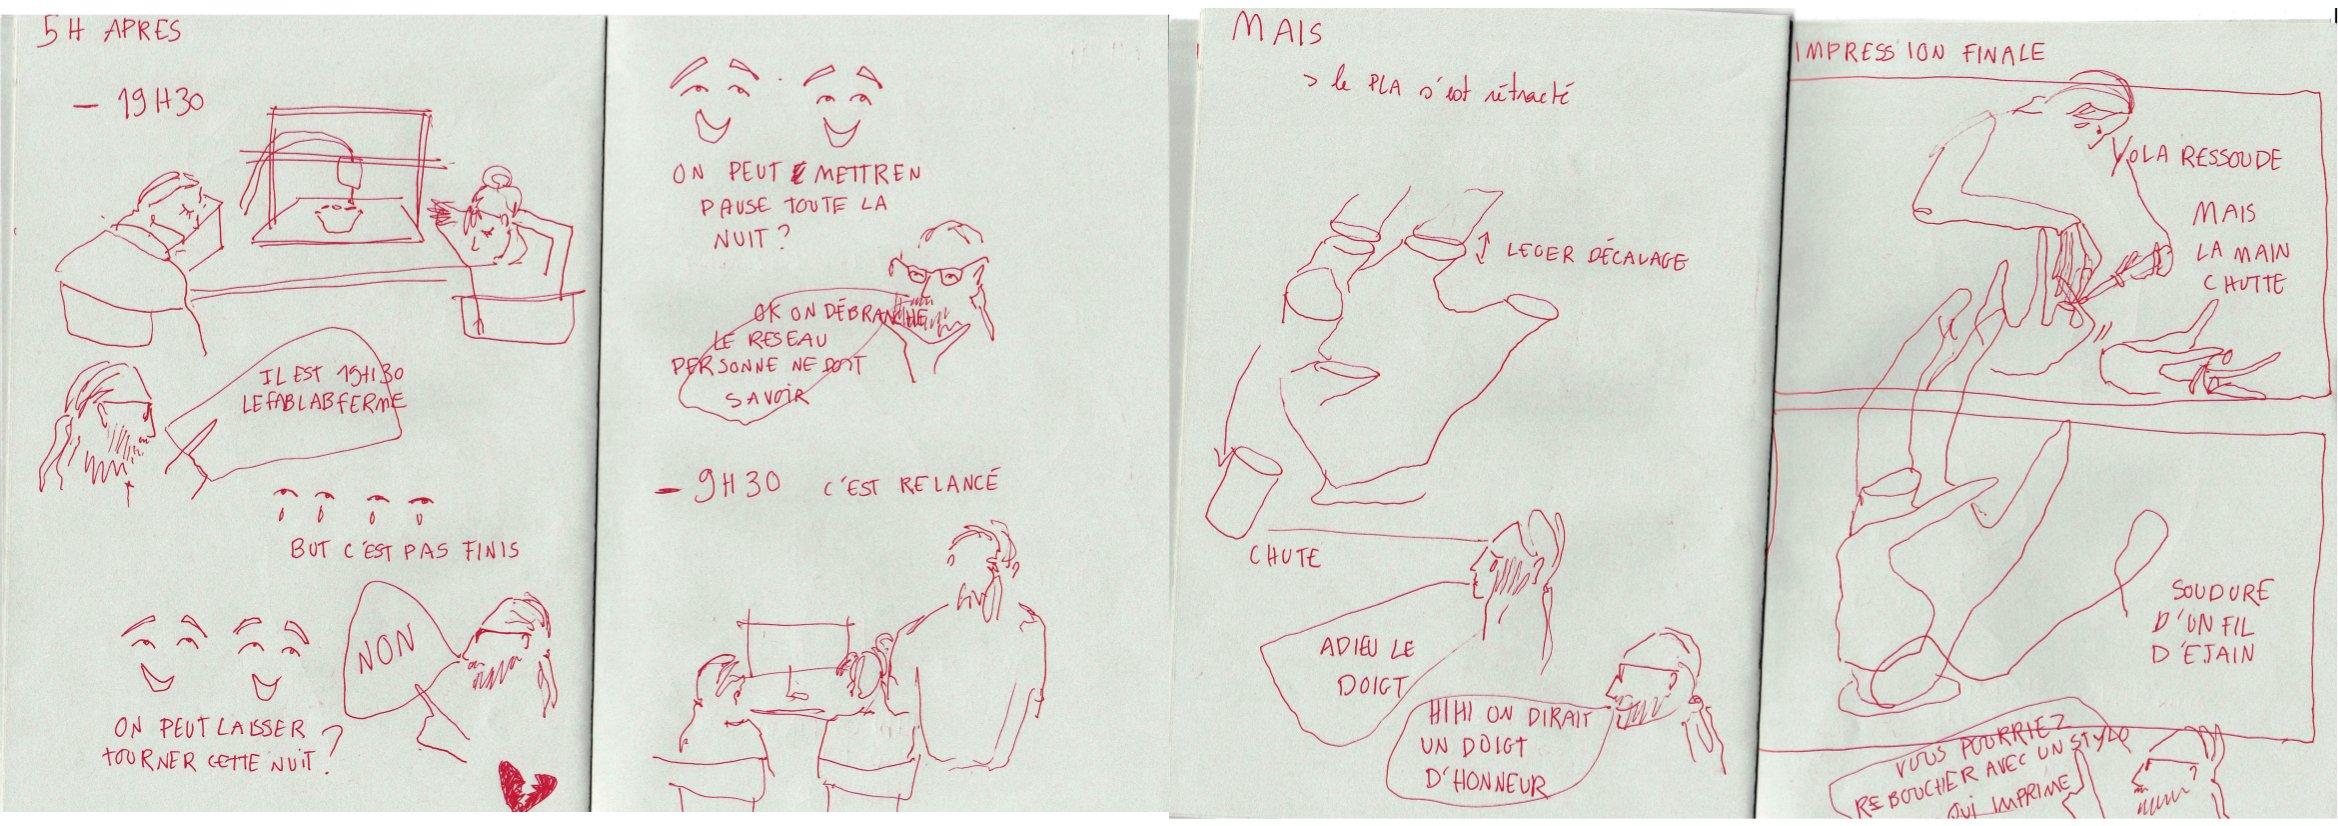 Mendes Mirabito recherches 18